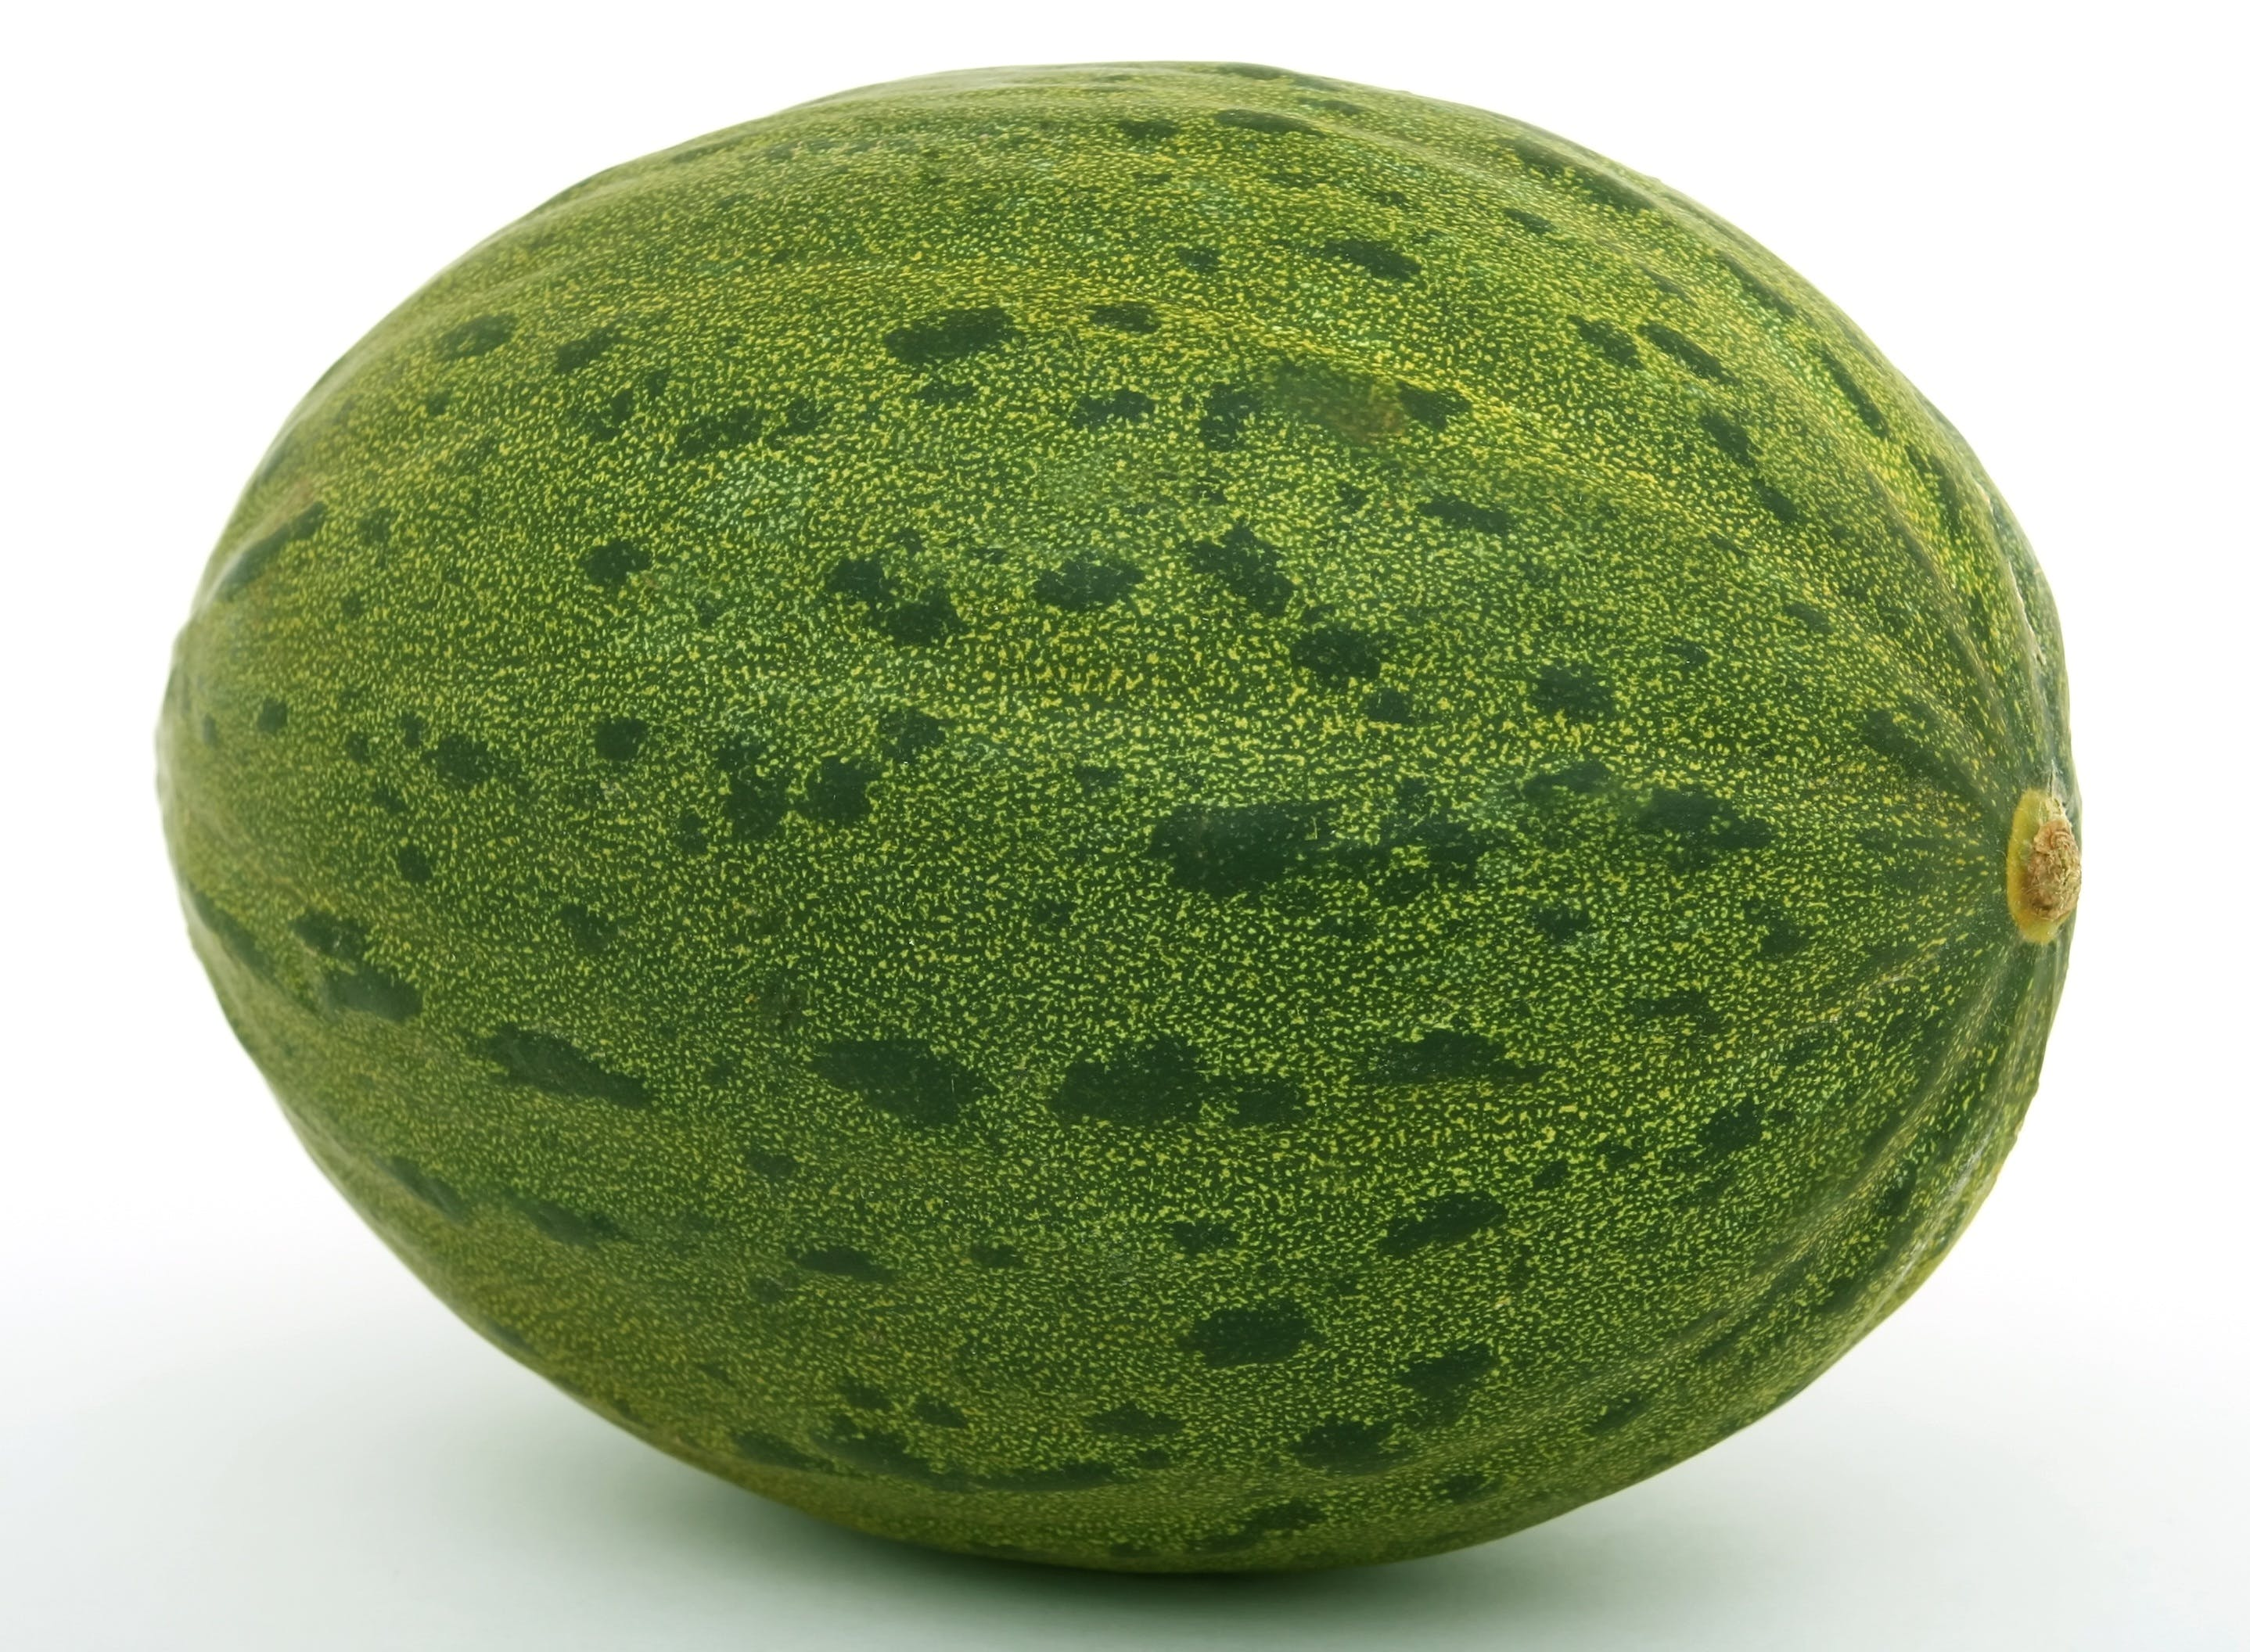 Green Oval Fruit